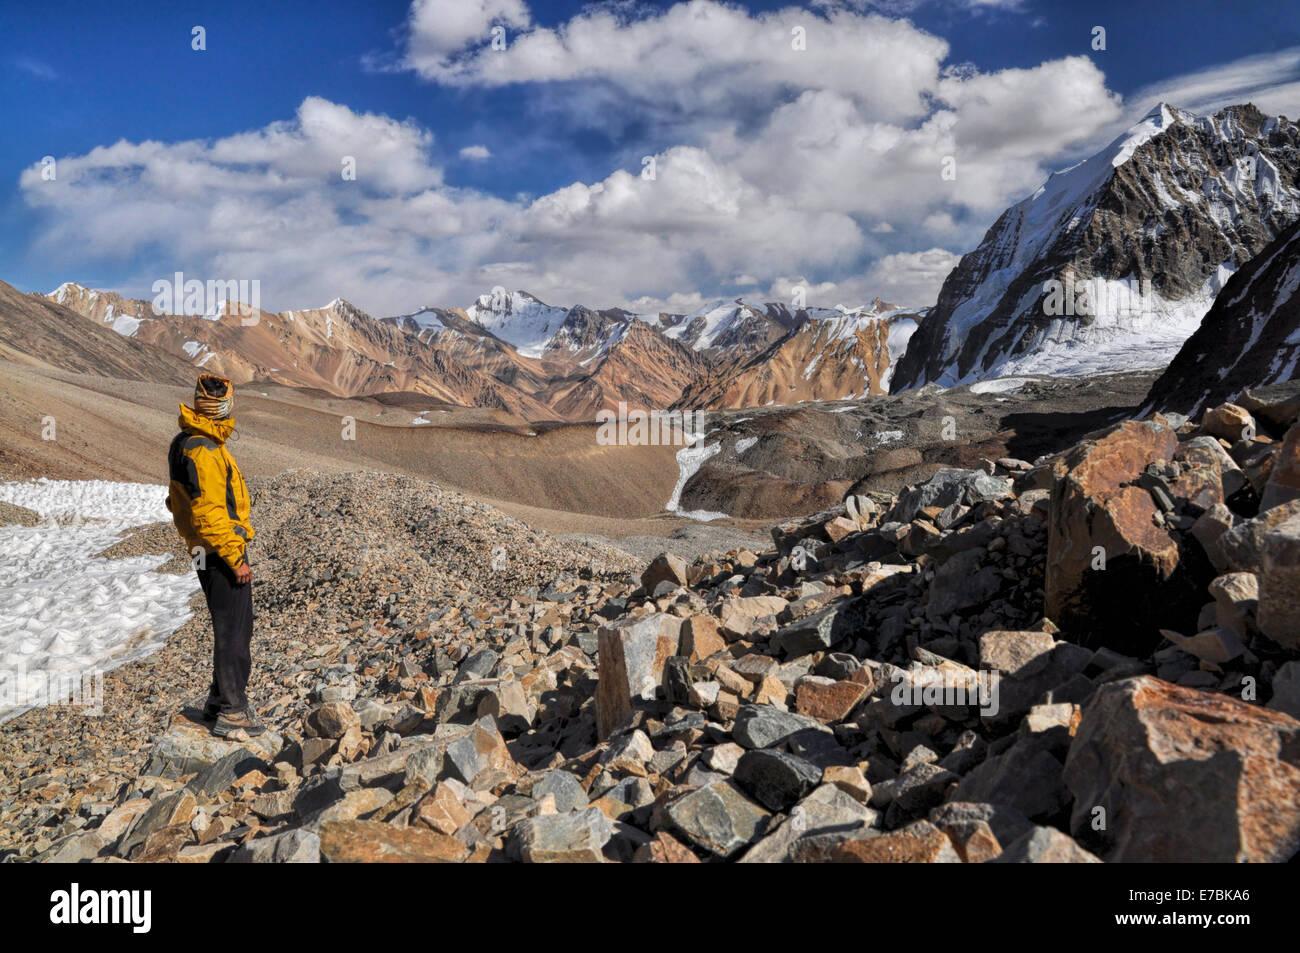 Young adventurer hiking in Pamir mountains in Tajikistan - Stock Image